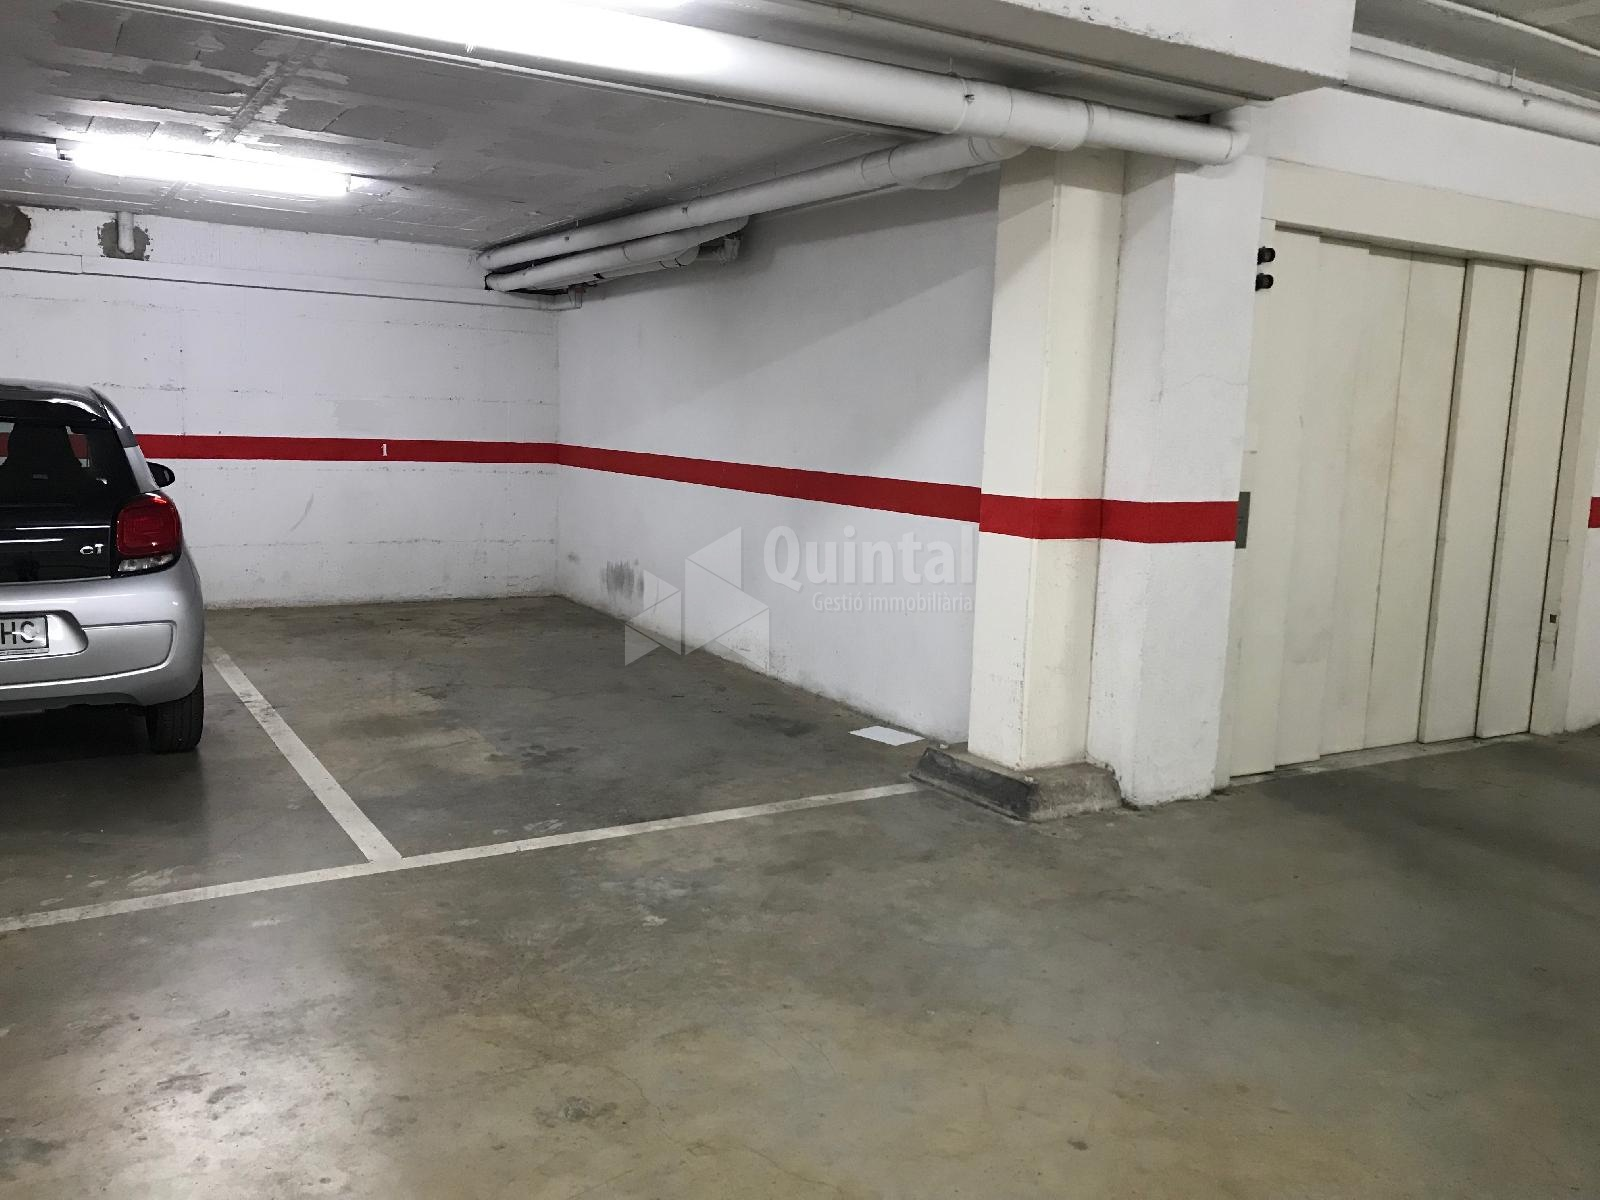 Plaça d'aparcament